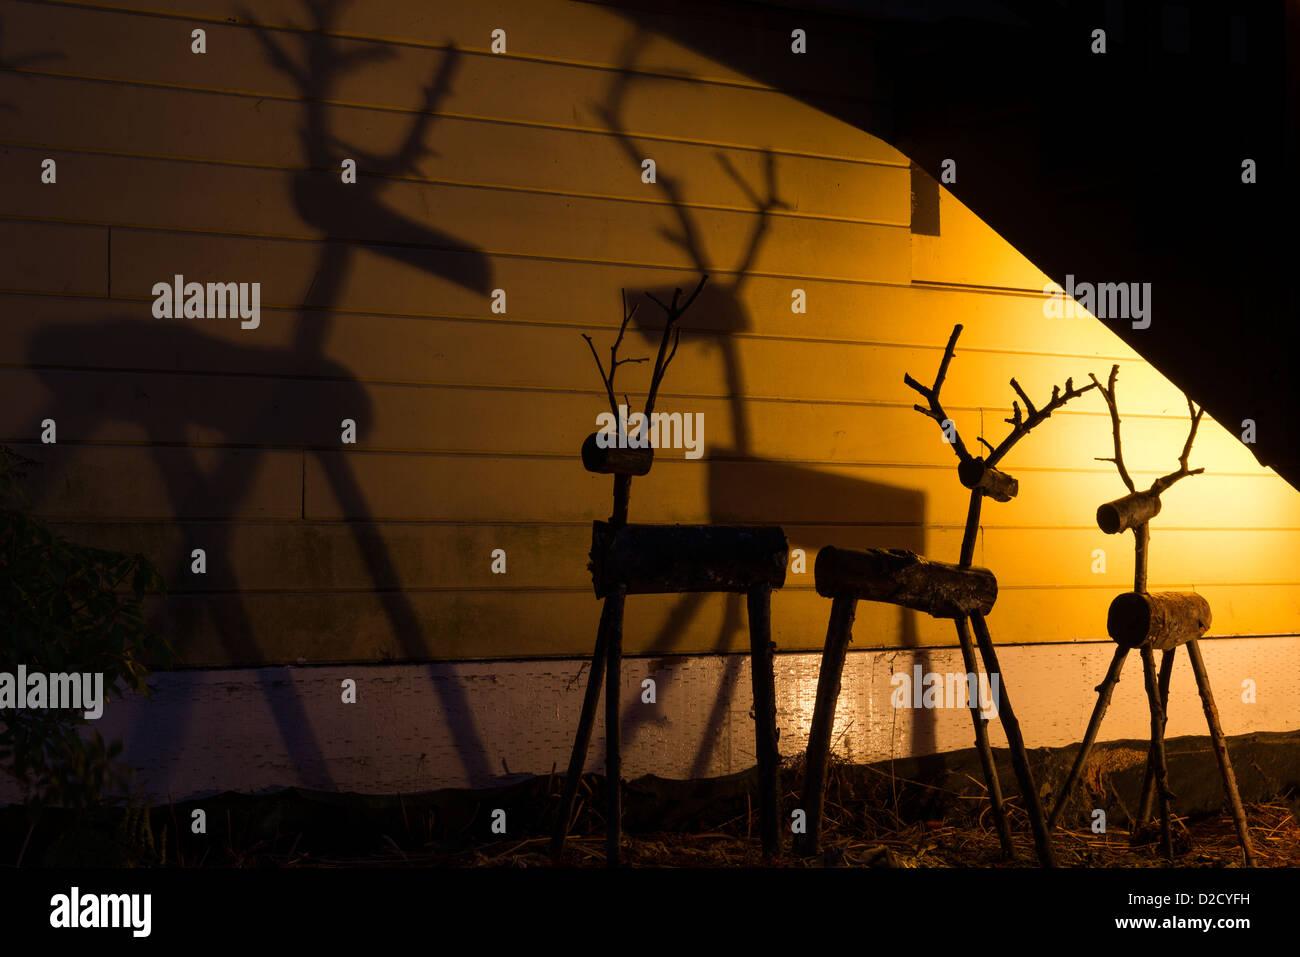 Christmas display of rustic reindeer and shadows. - Stock Image